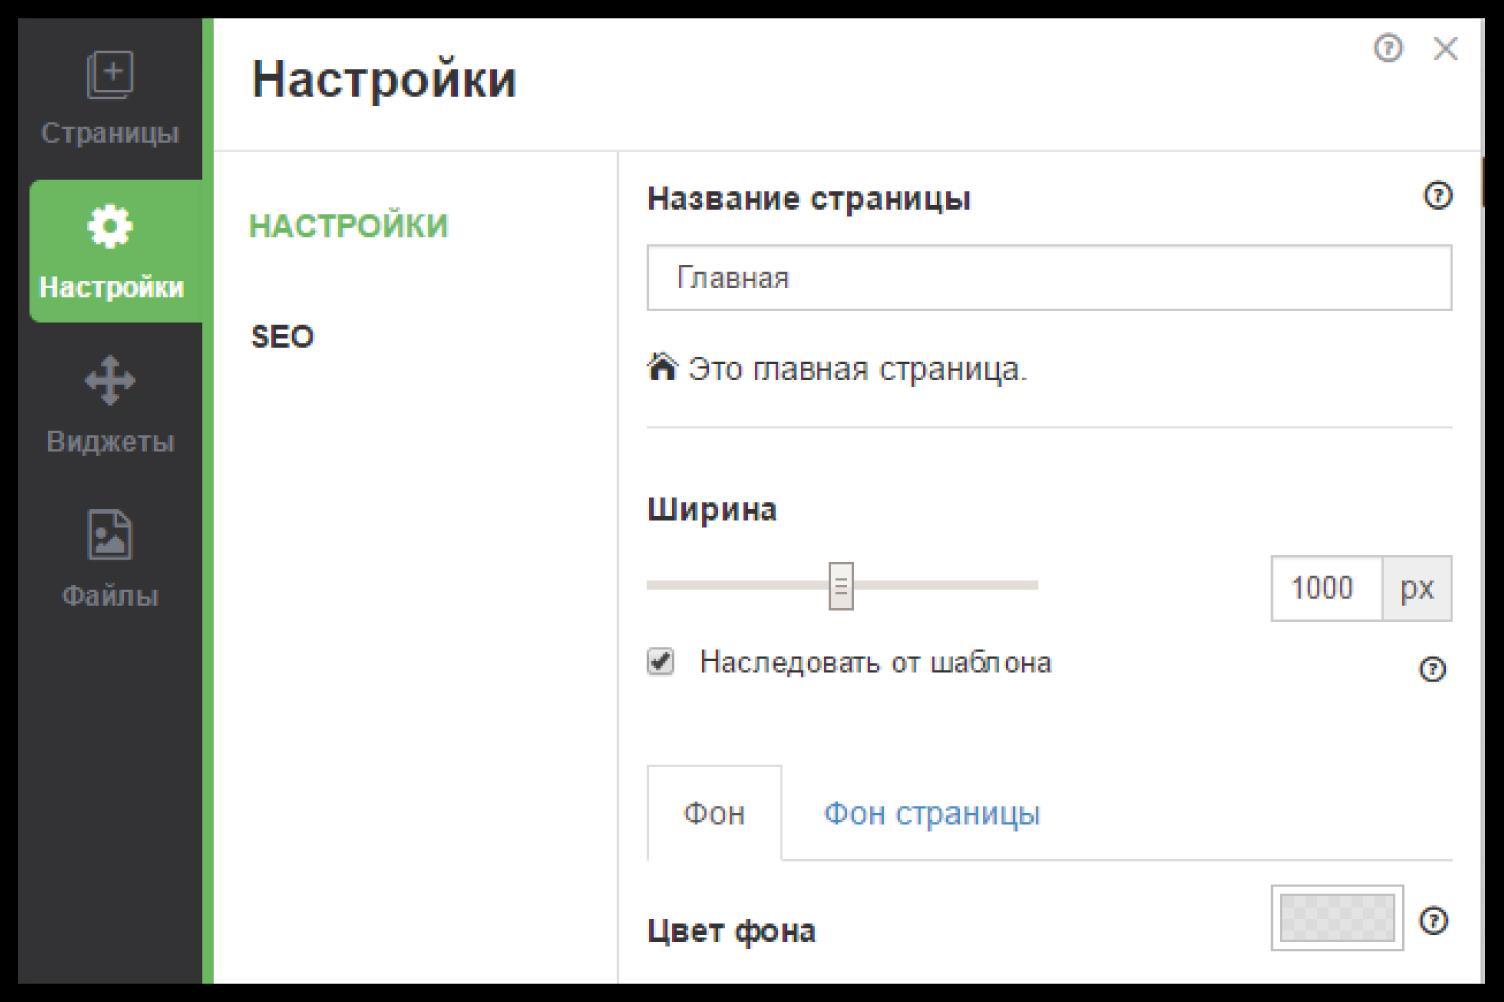 http://adw-kupon.ru/a5/a5-5.jpg